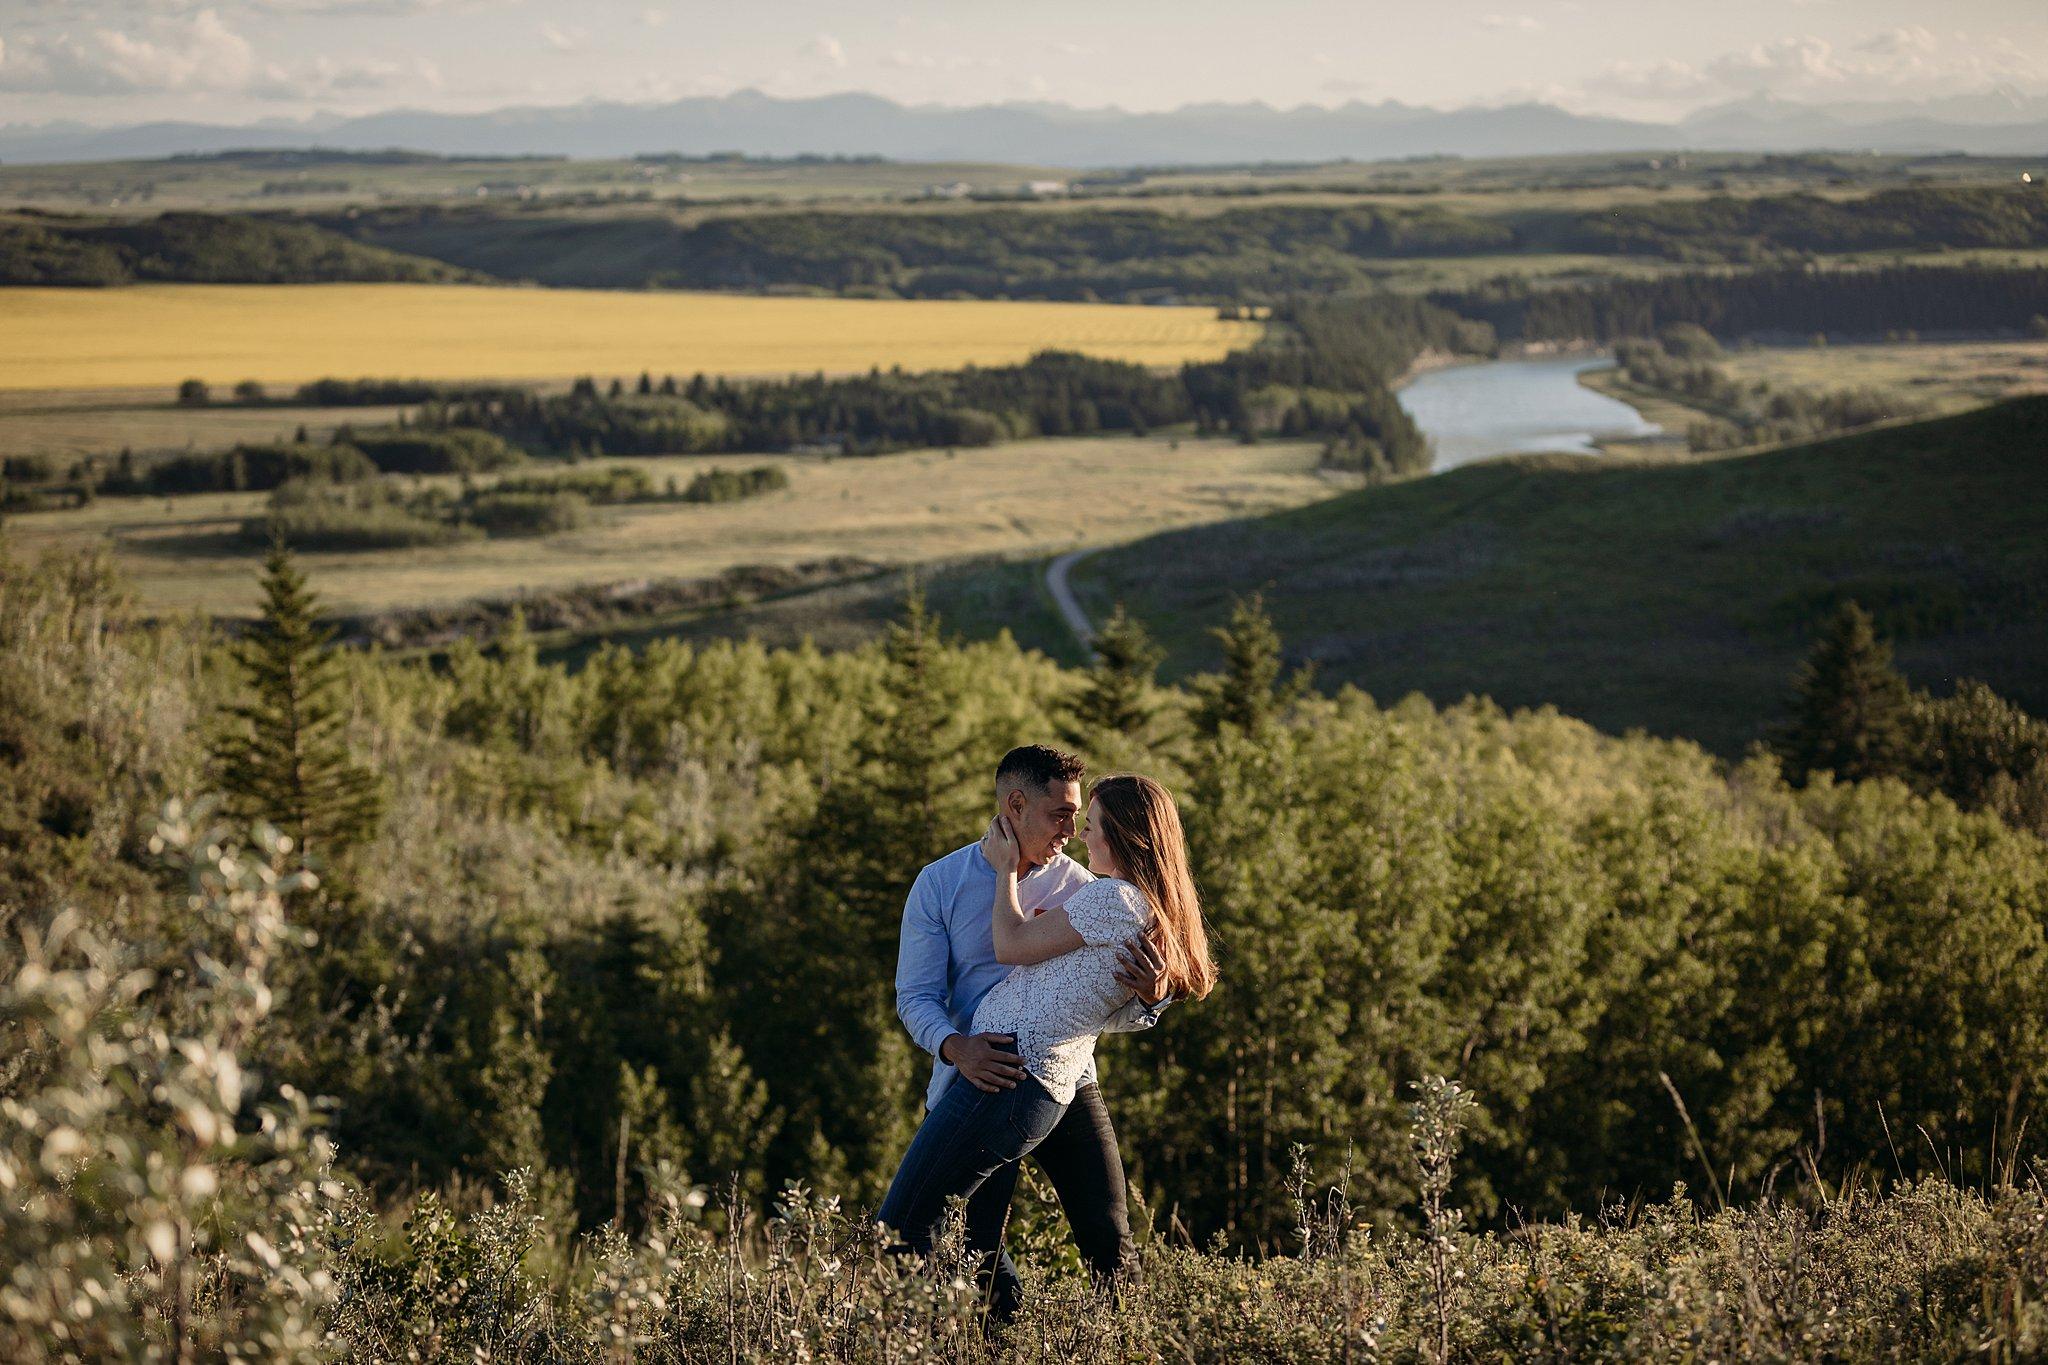 Ashley Daphne Photography Calgary Wedding Couple Family Photographer YYC Engagement Photographer Glenbow Ranch Provincial Park Engagement Photos Couple Photography_0039.jpg